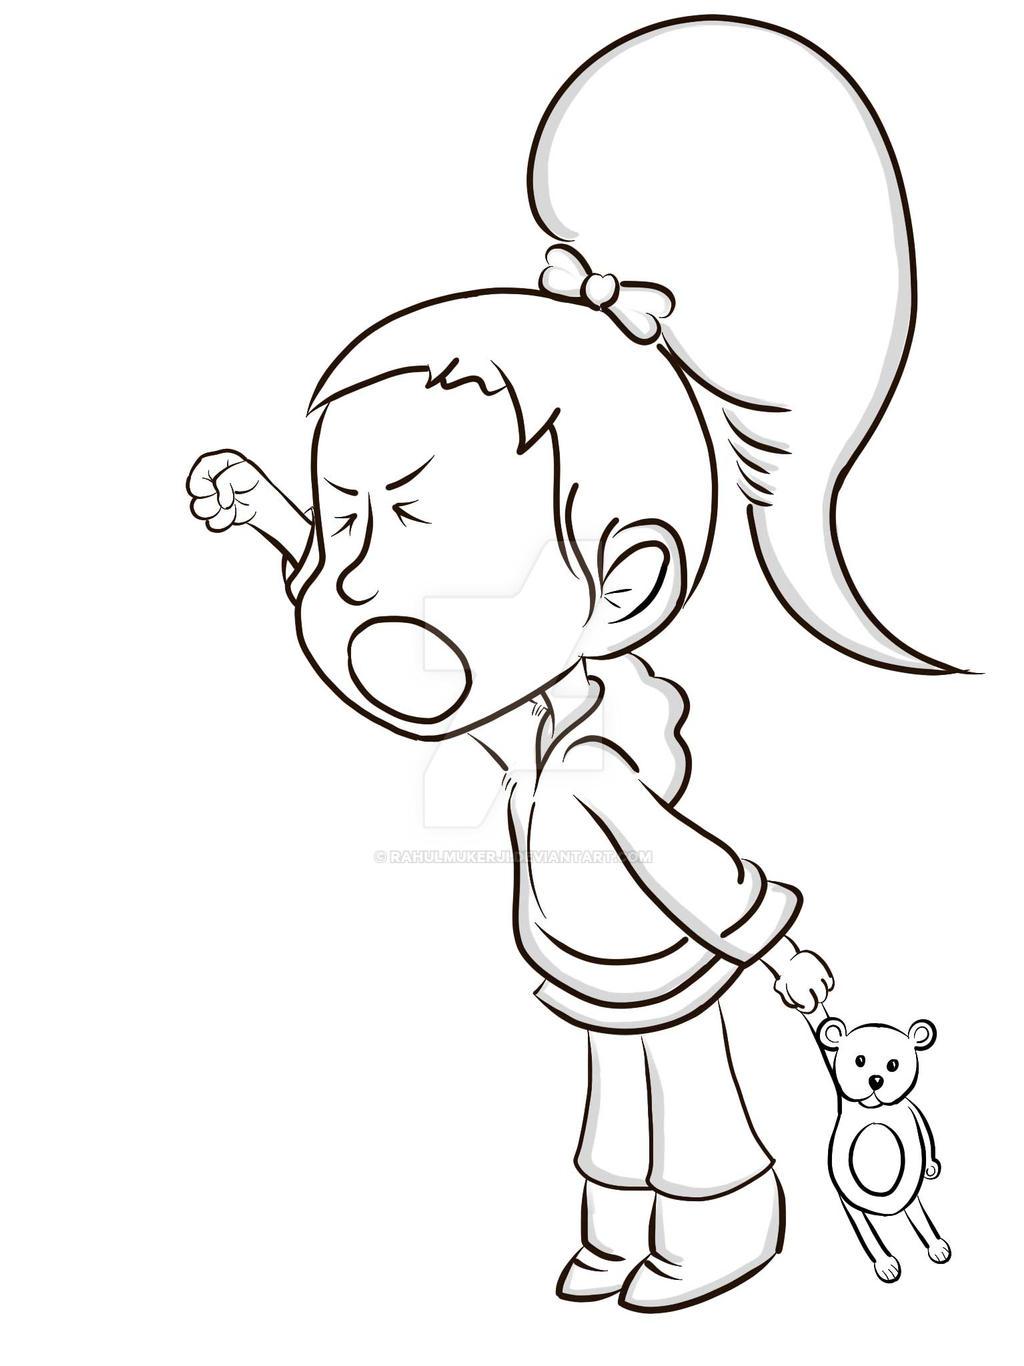 Cartoon Character Design